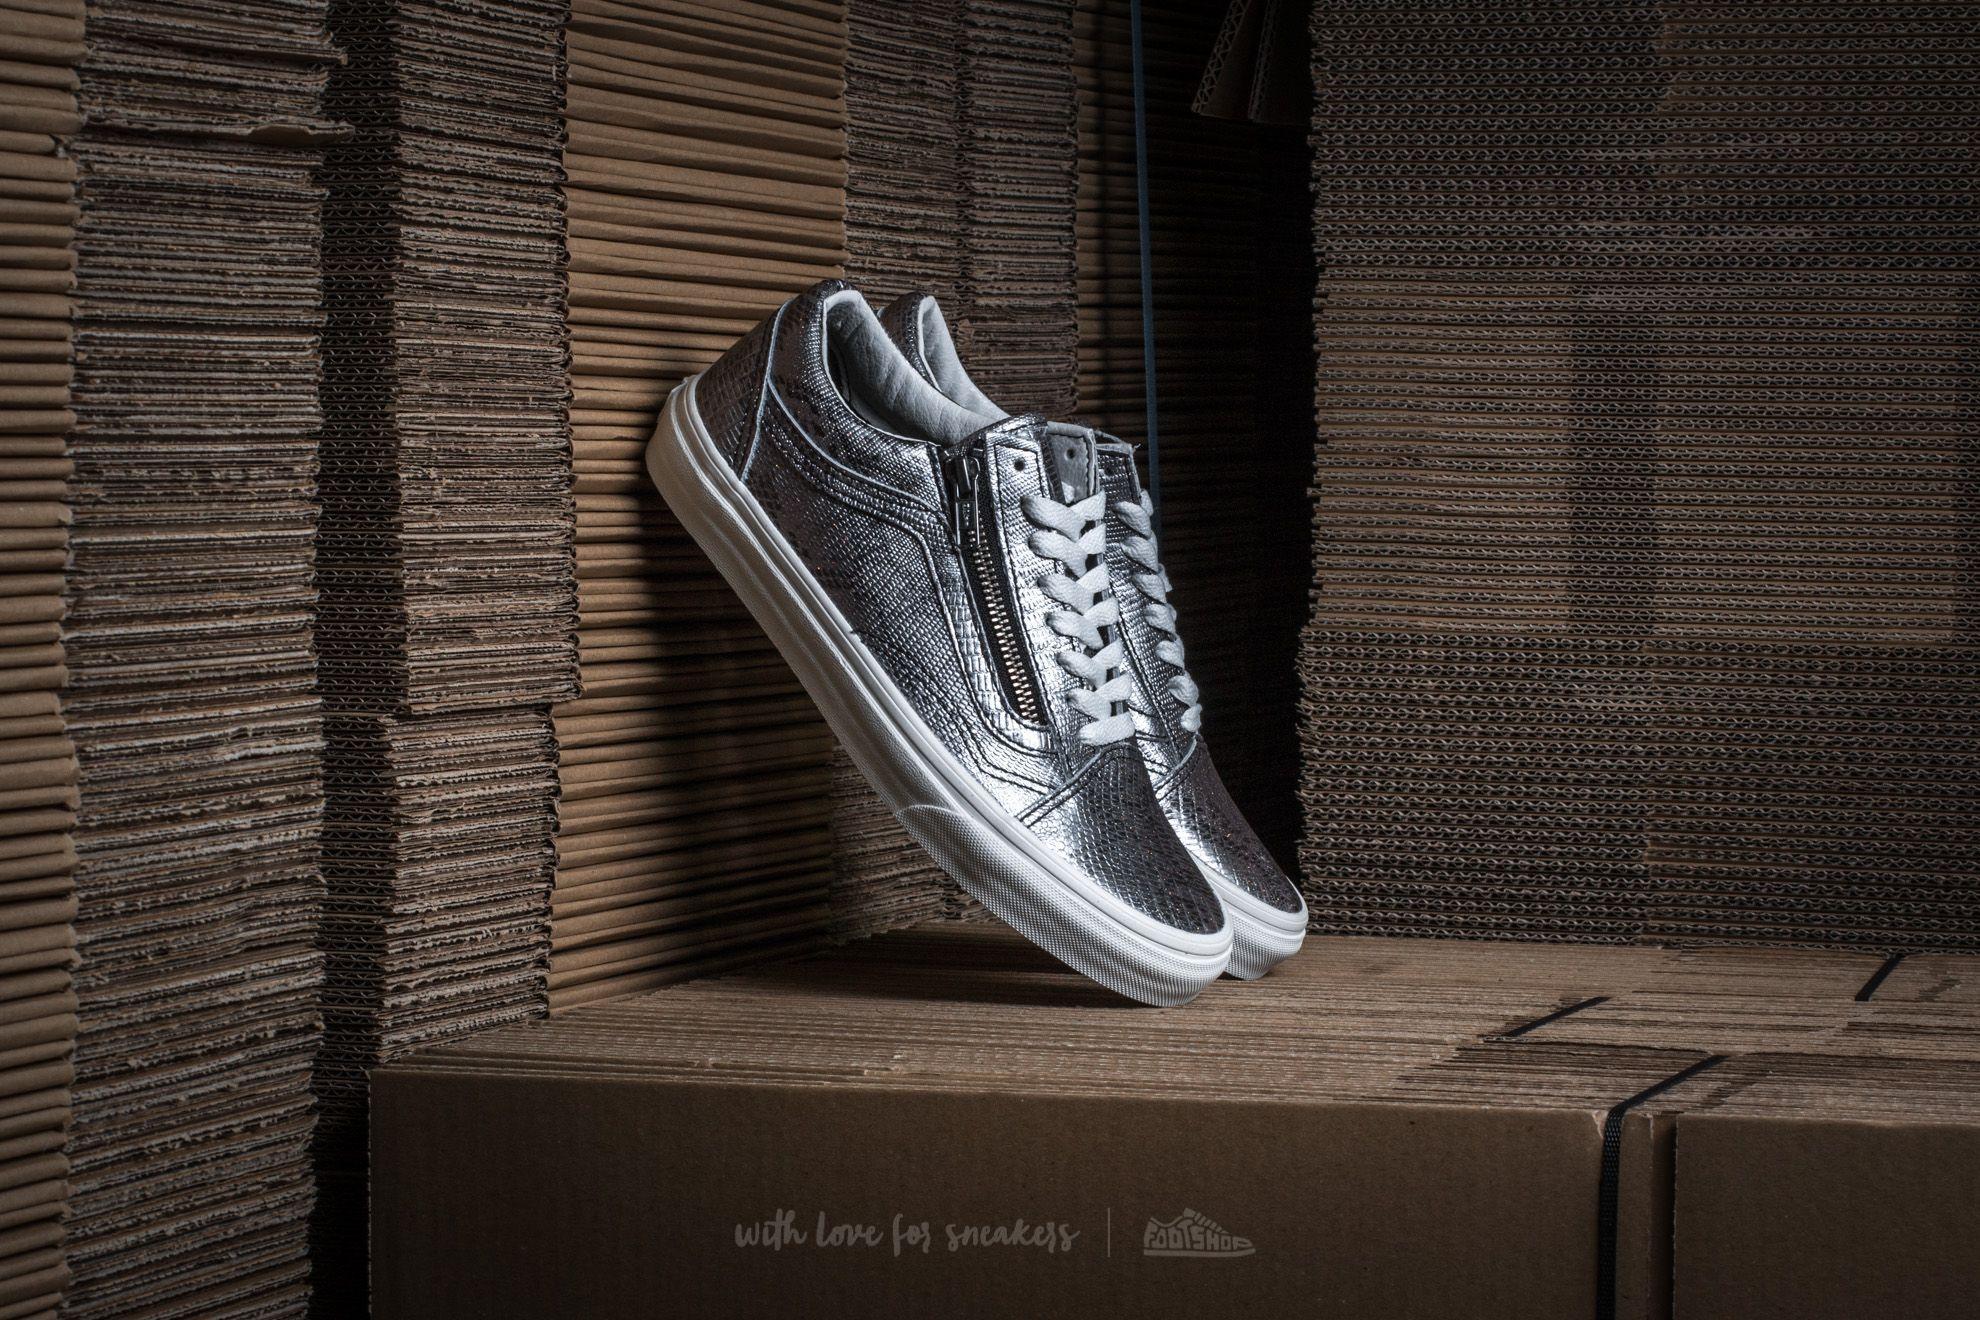 d07b541d08 Vans Old Skool Zip (Disco Python) Black  Blanc de Blanc